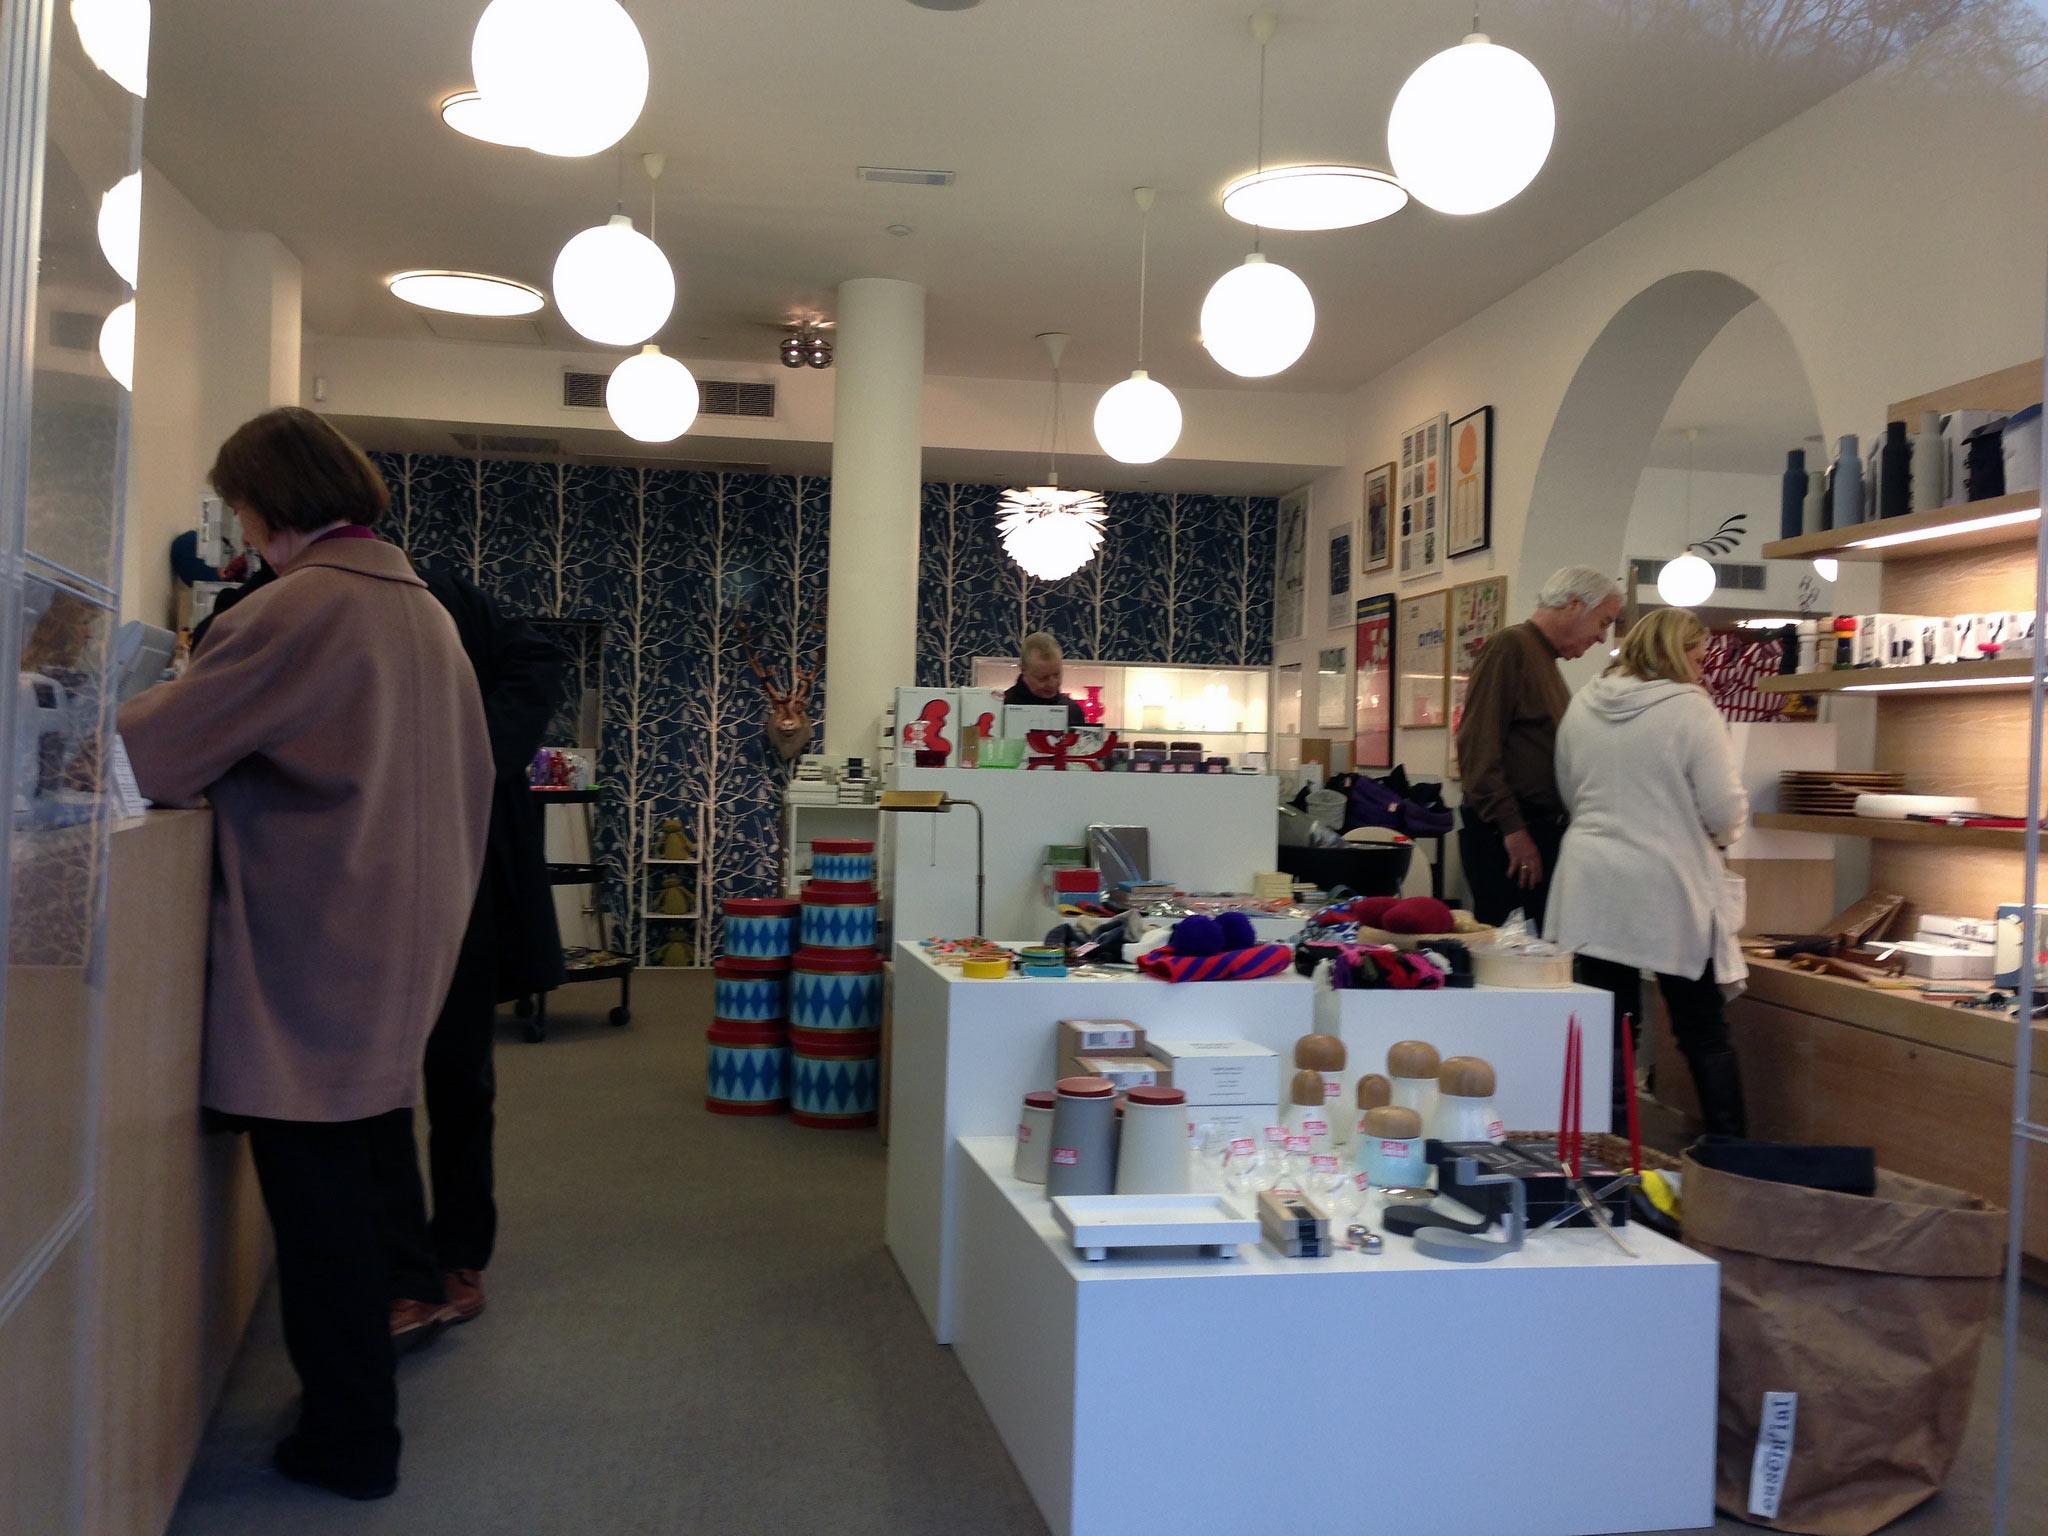 Sophisticated scandinavian interior shop london photos for Scandinavian home store